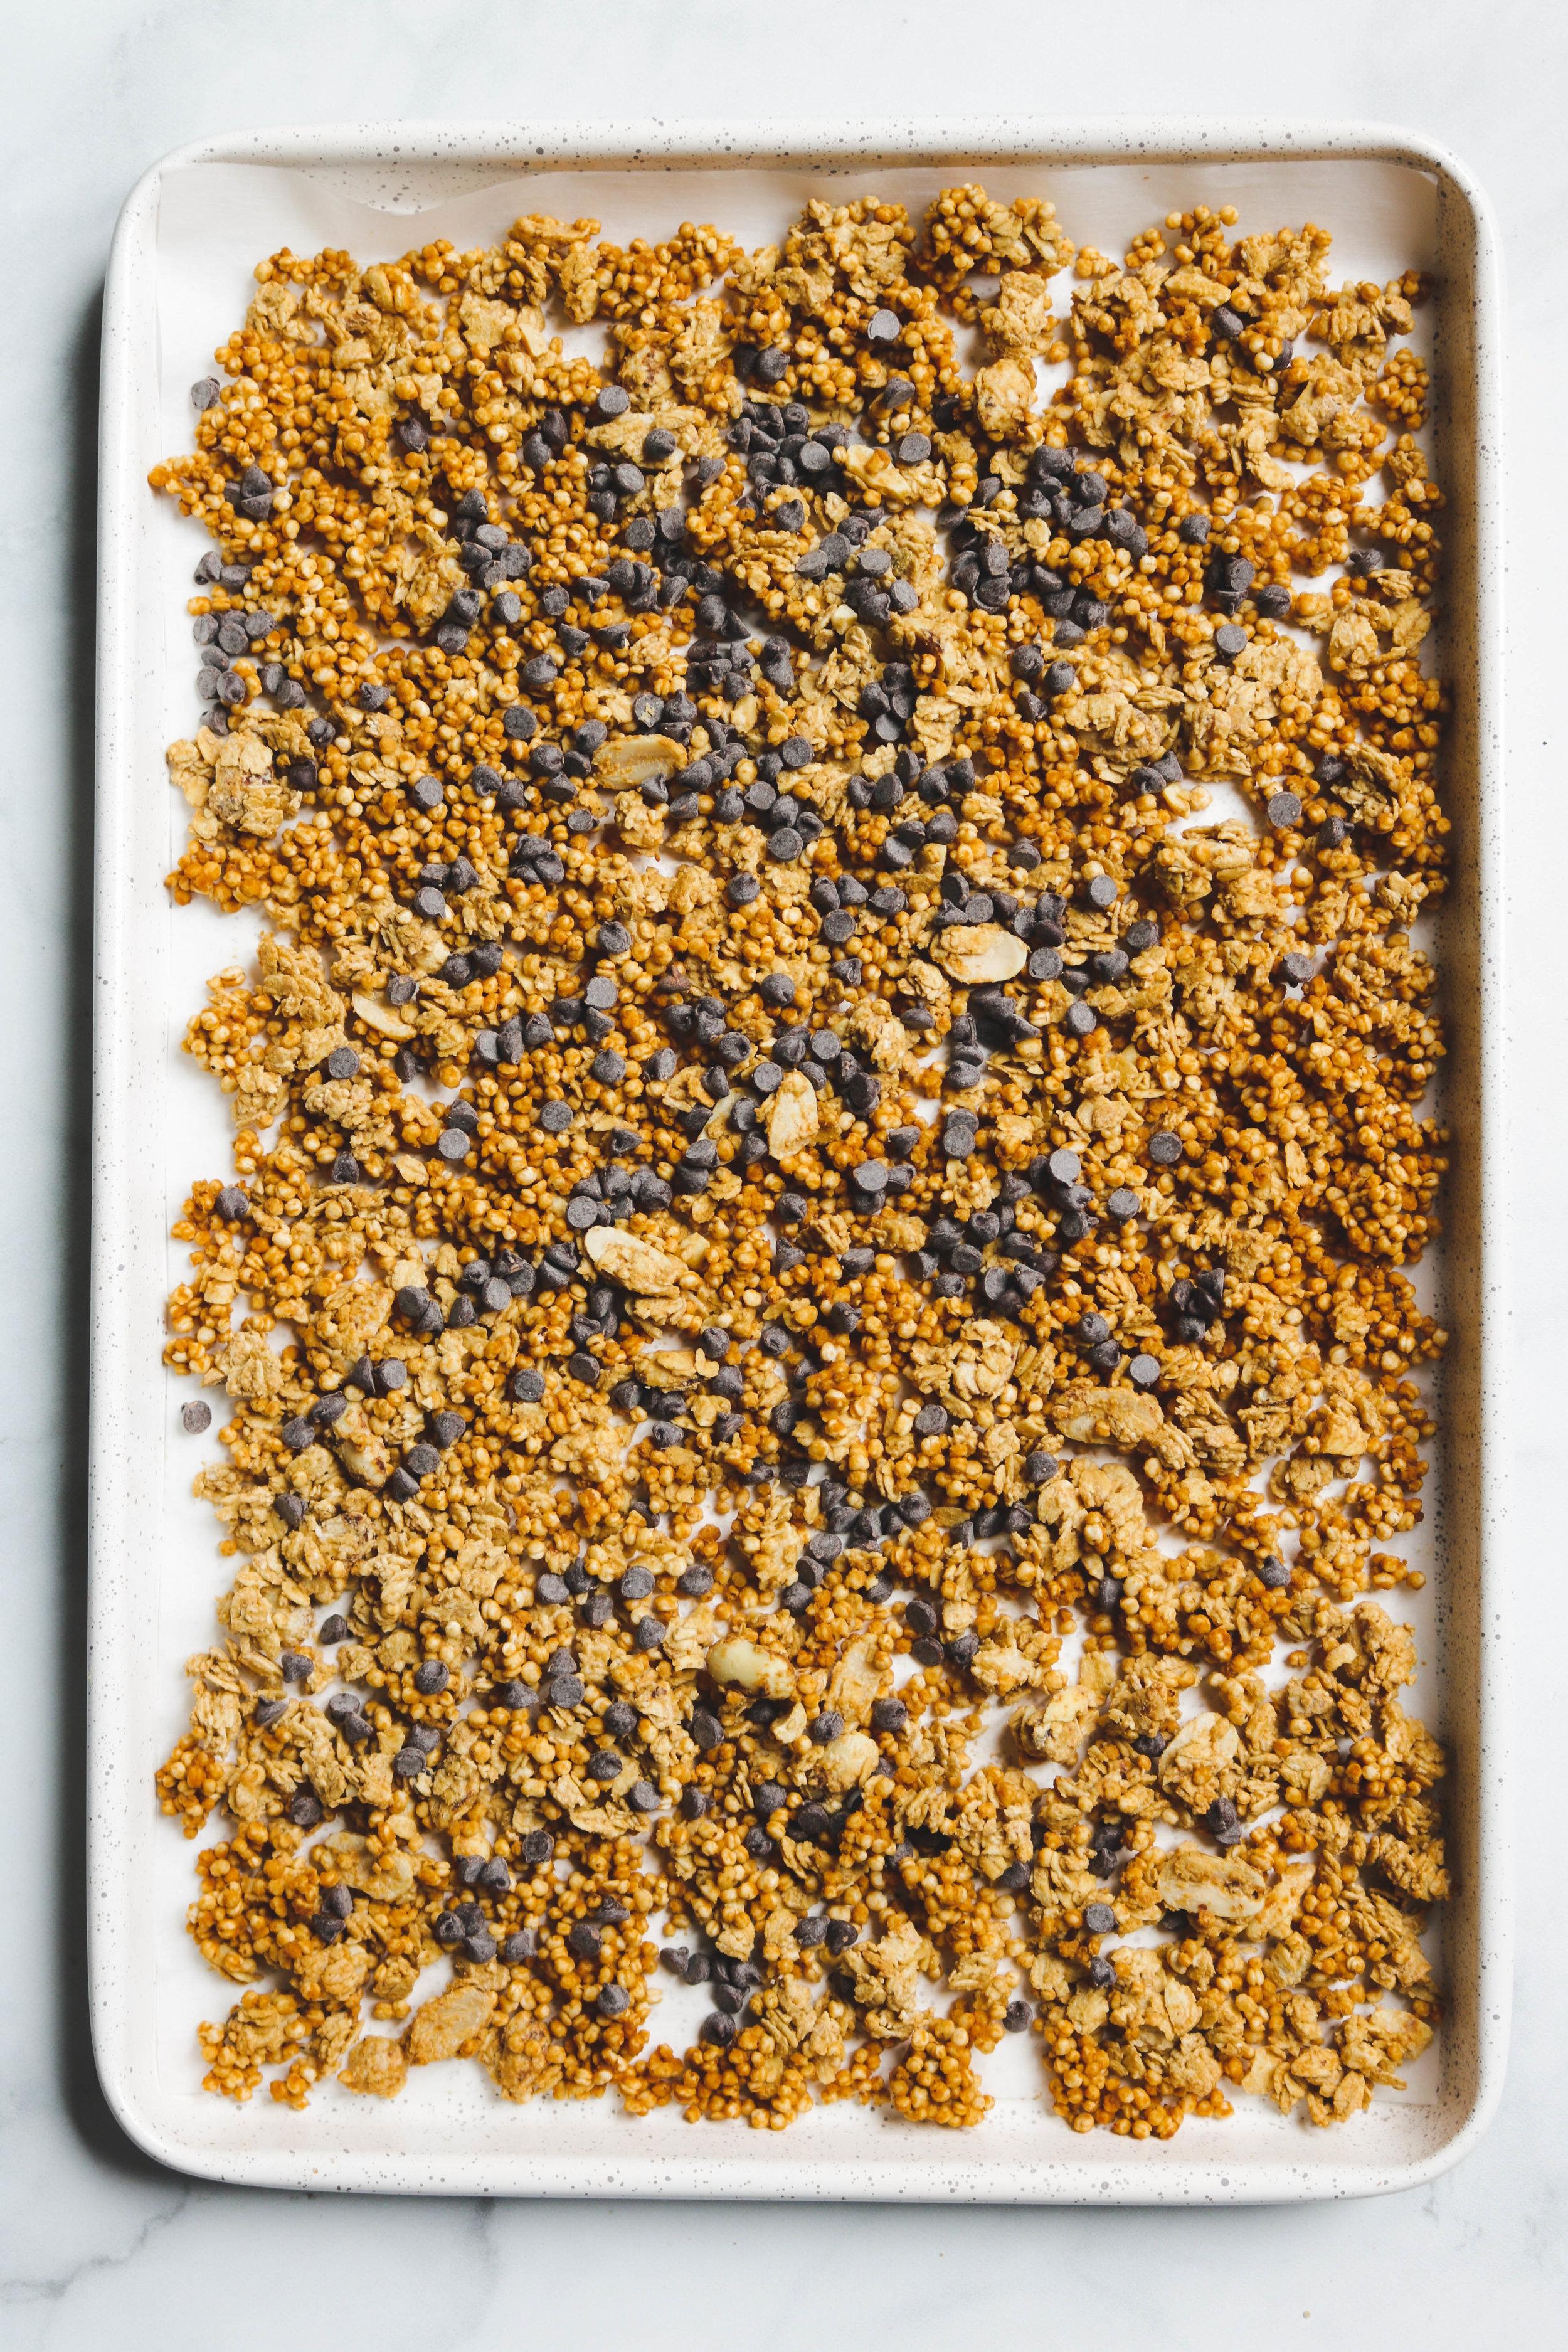 snickers chocolate peanut butter caramel granola-4.jpg